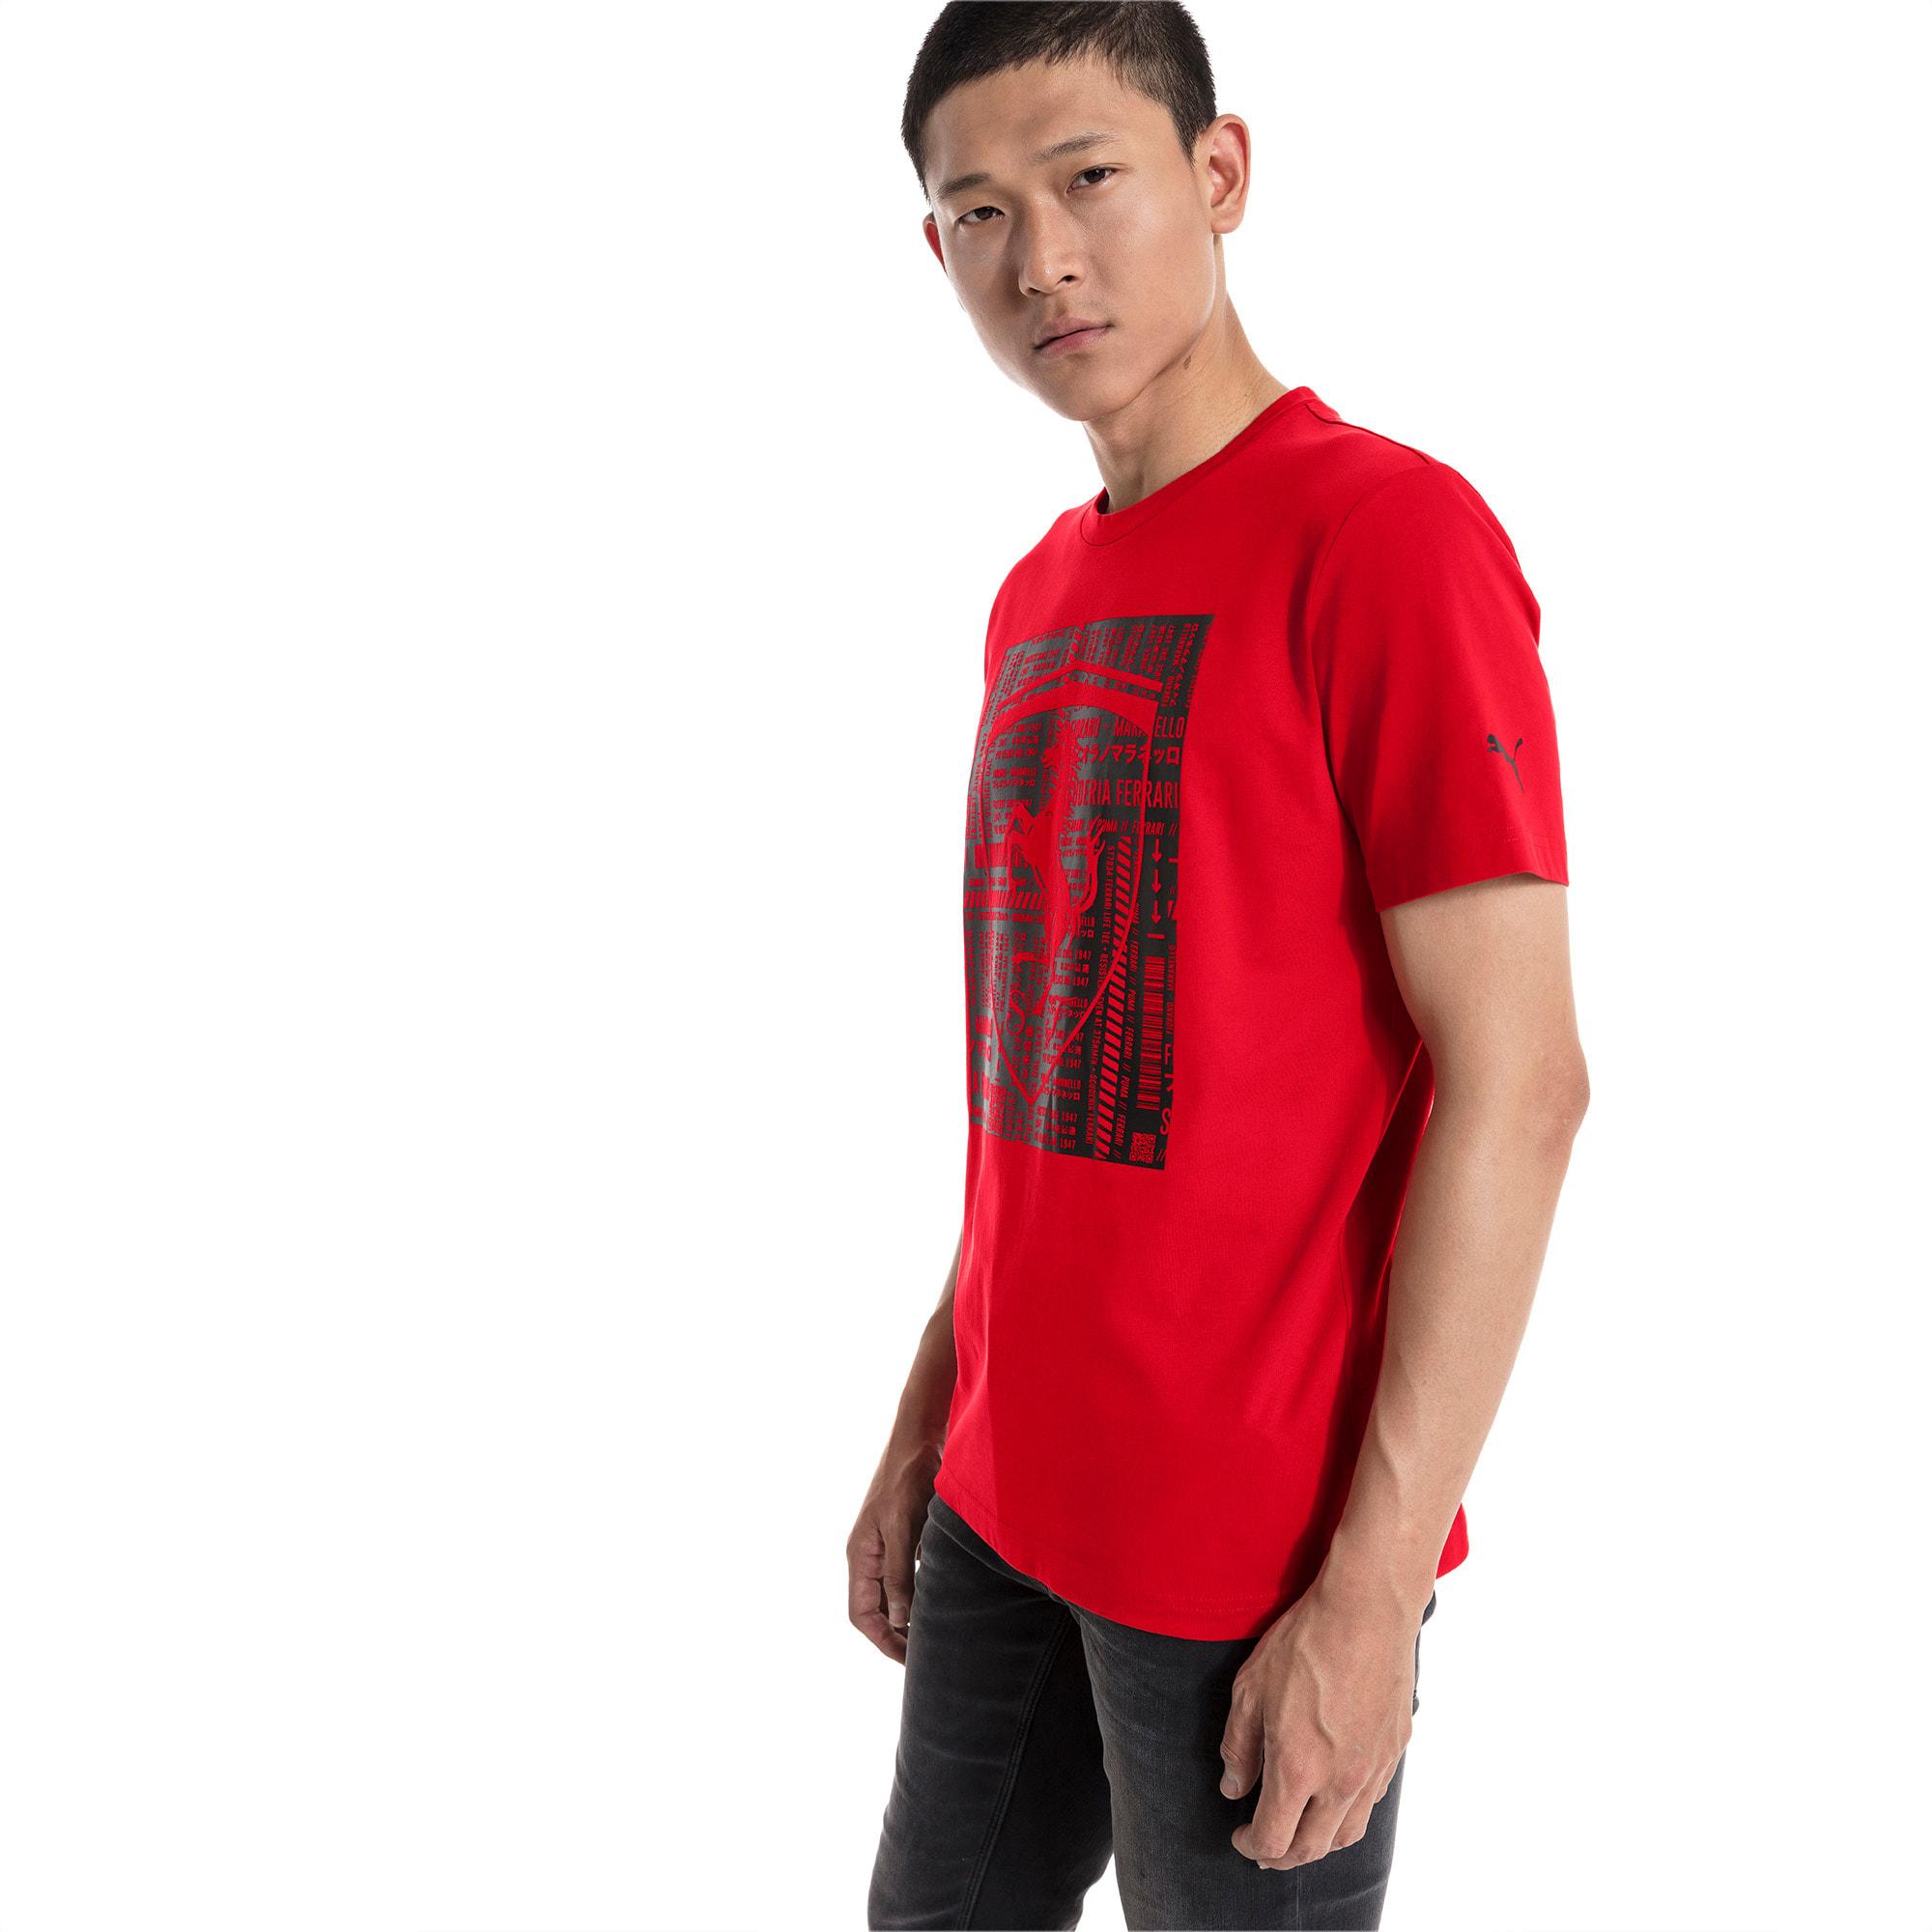 PUMA Mens Standard Scuderia Ferrari Big Shield T-Shirt